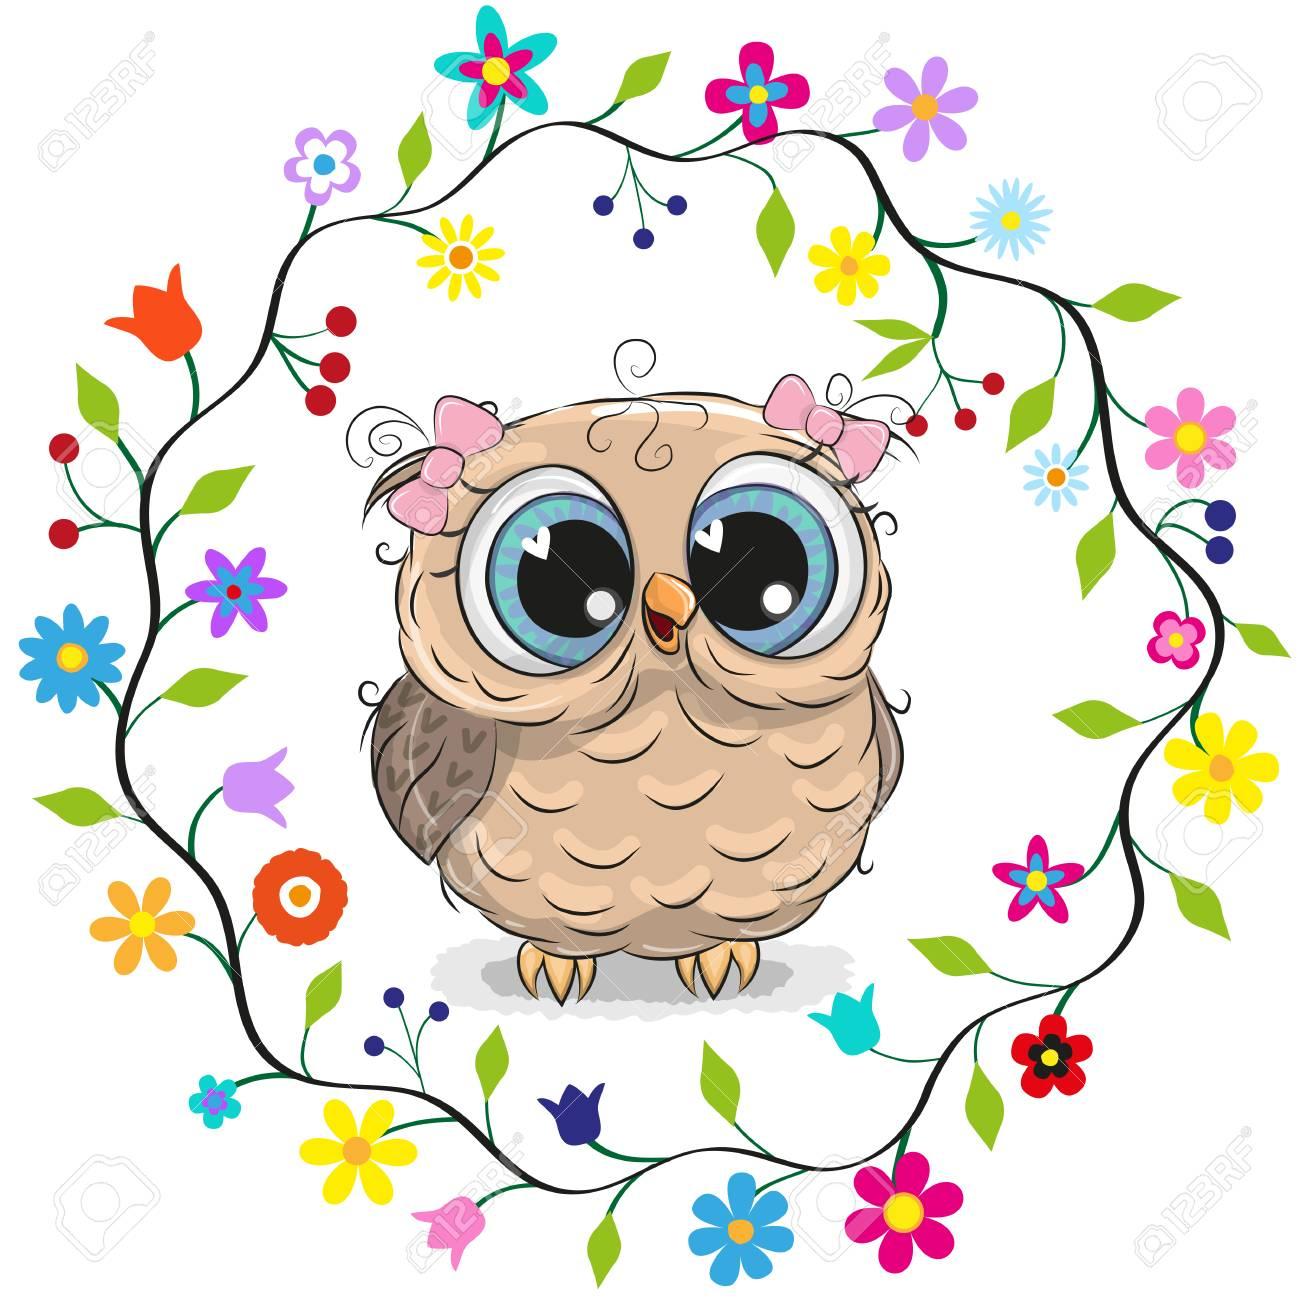 Cute cartoon owl girl in a flowers frame. - 99560440